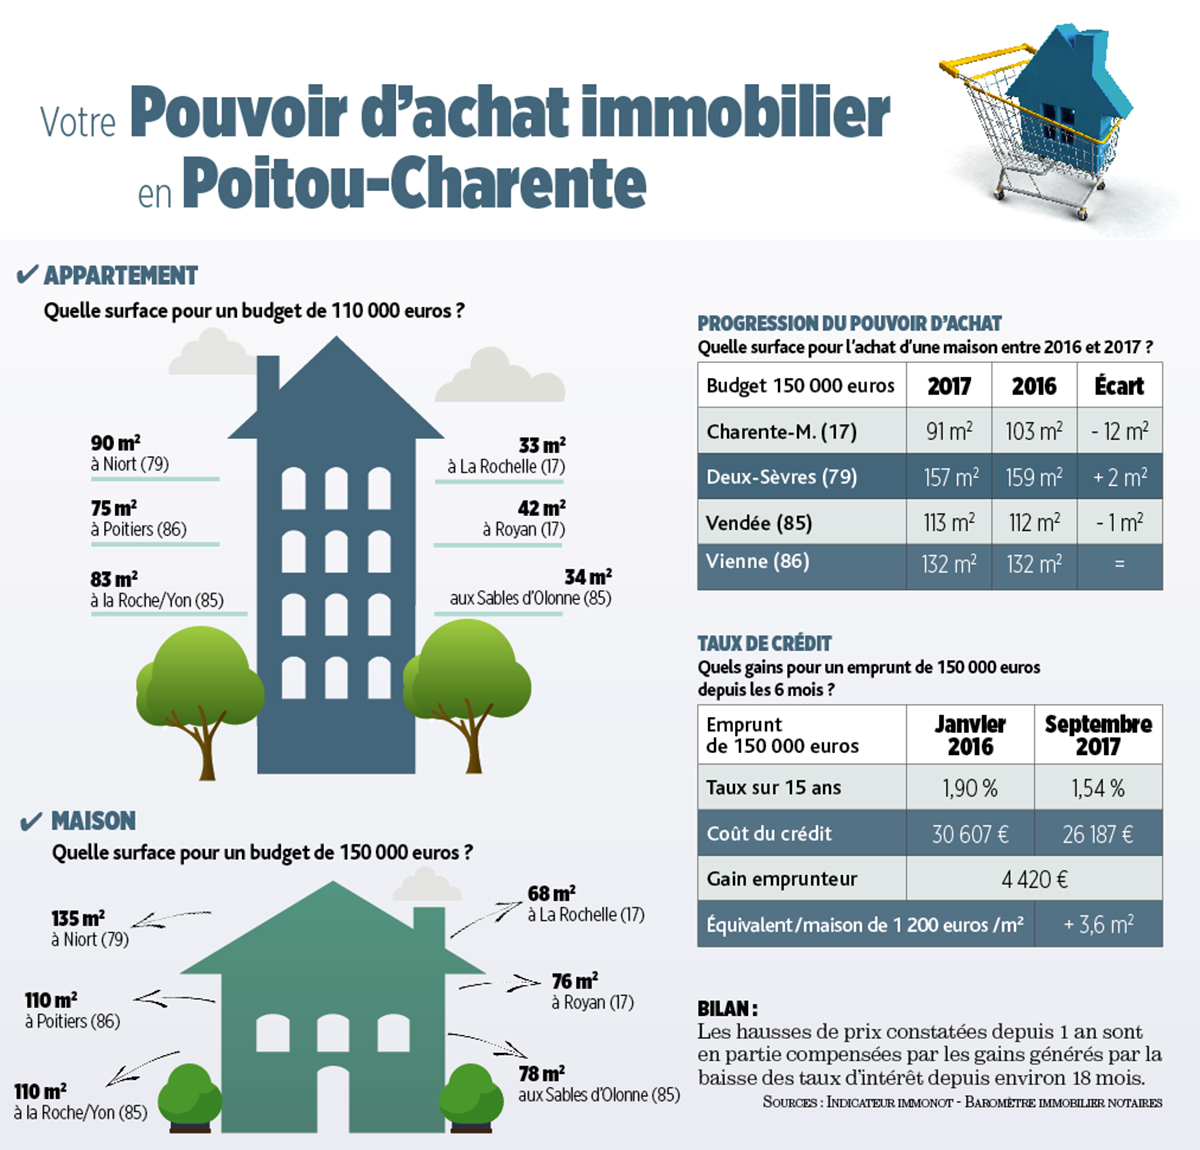 Budget de 150 000 euros que pouvez vous acheter en for Modele maison 150 000 euros